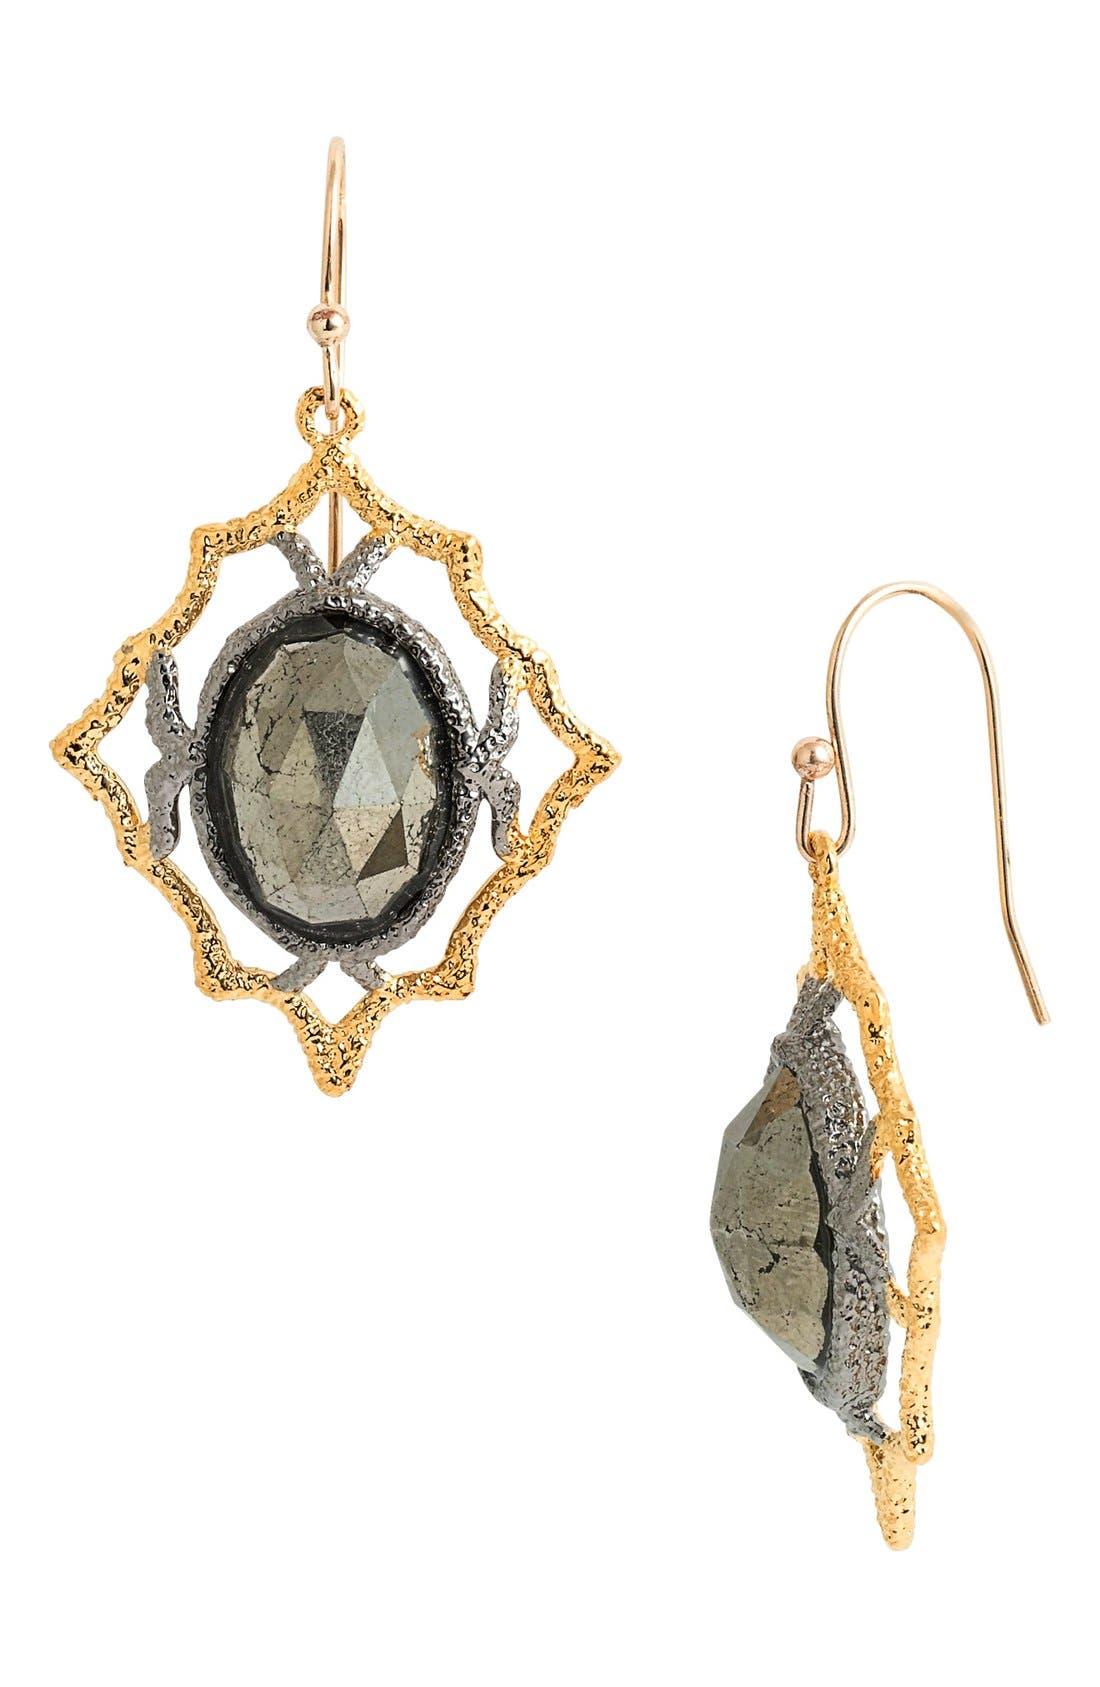 Alternate Image 1 Selected - Alexis Bittar 'Elements - Jardin de Papillon' Drop Earrings